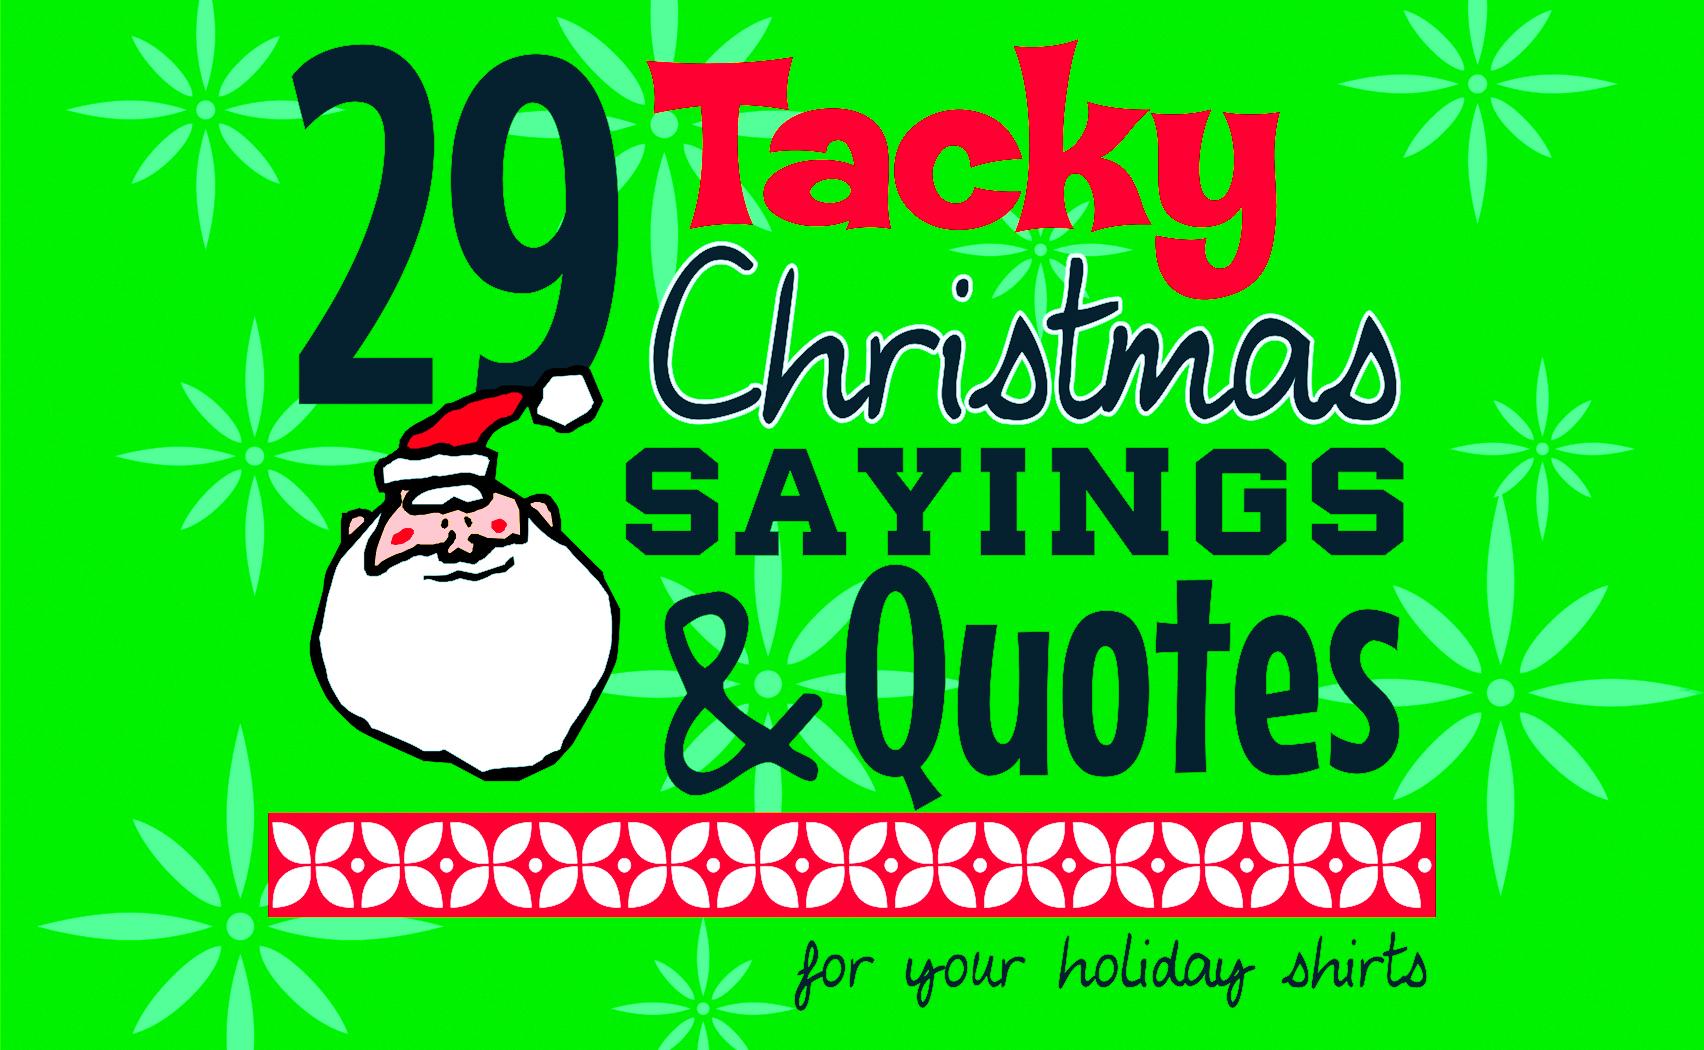 IZA Design Blog|Tacky Christmas Sayings and Quotes